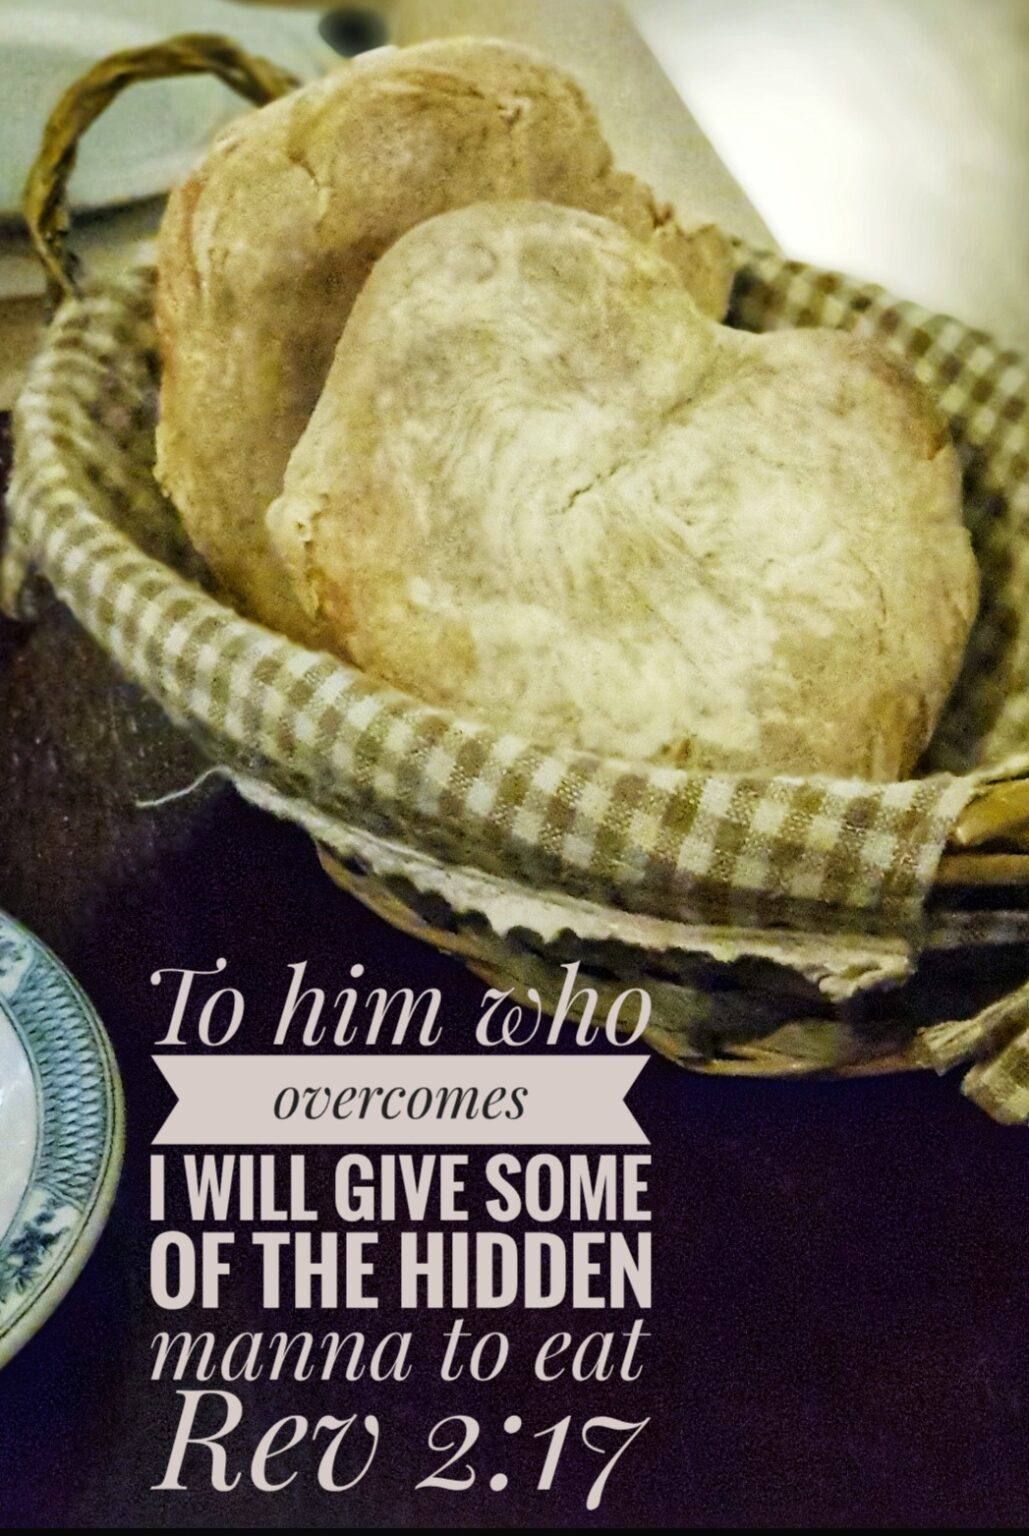 Hidden manna Rev 2:17